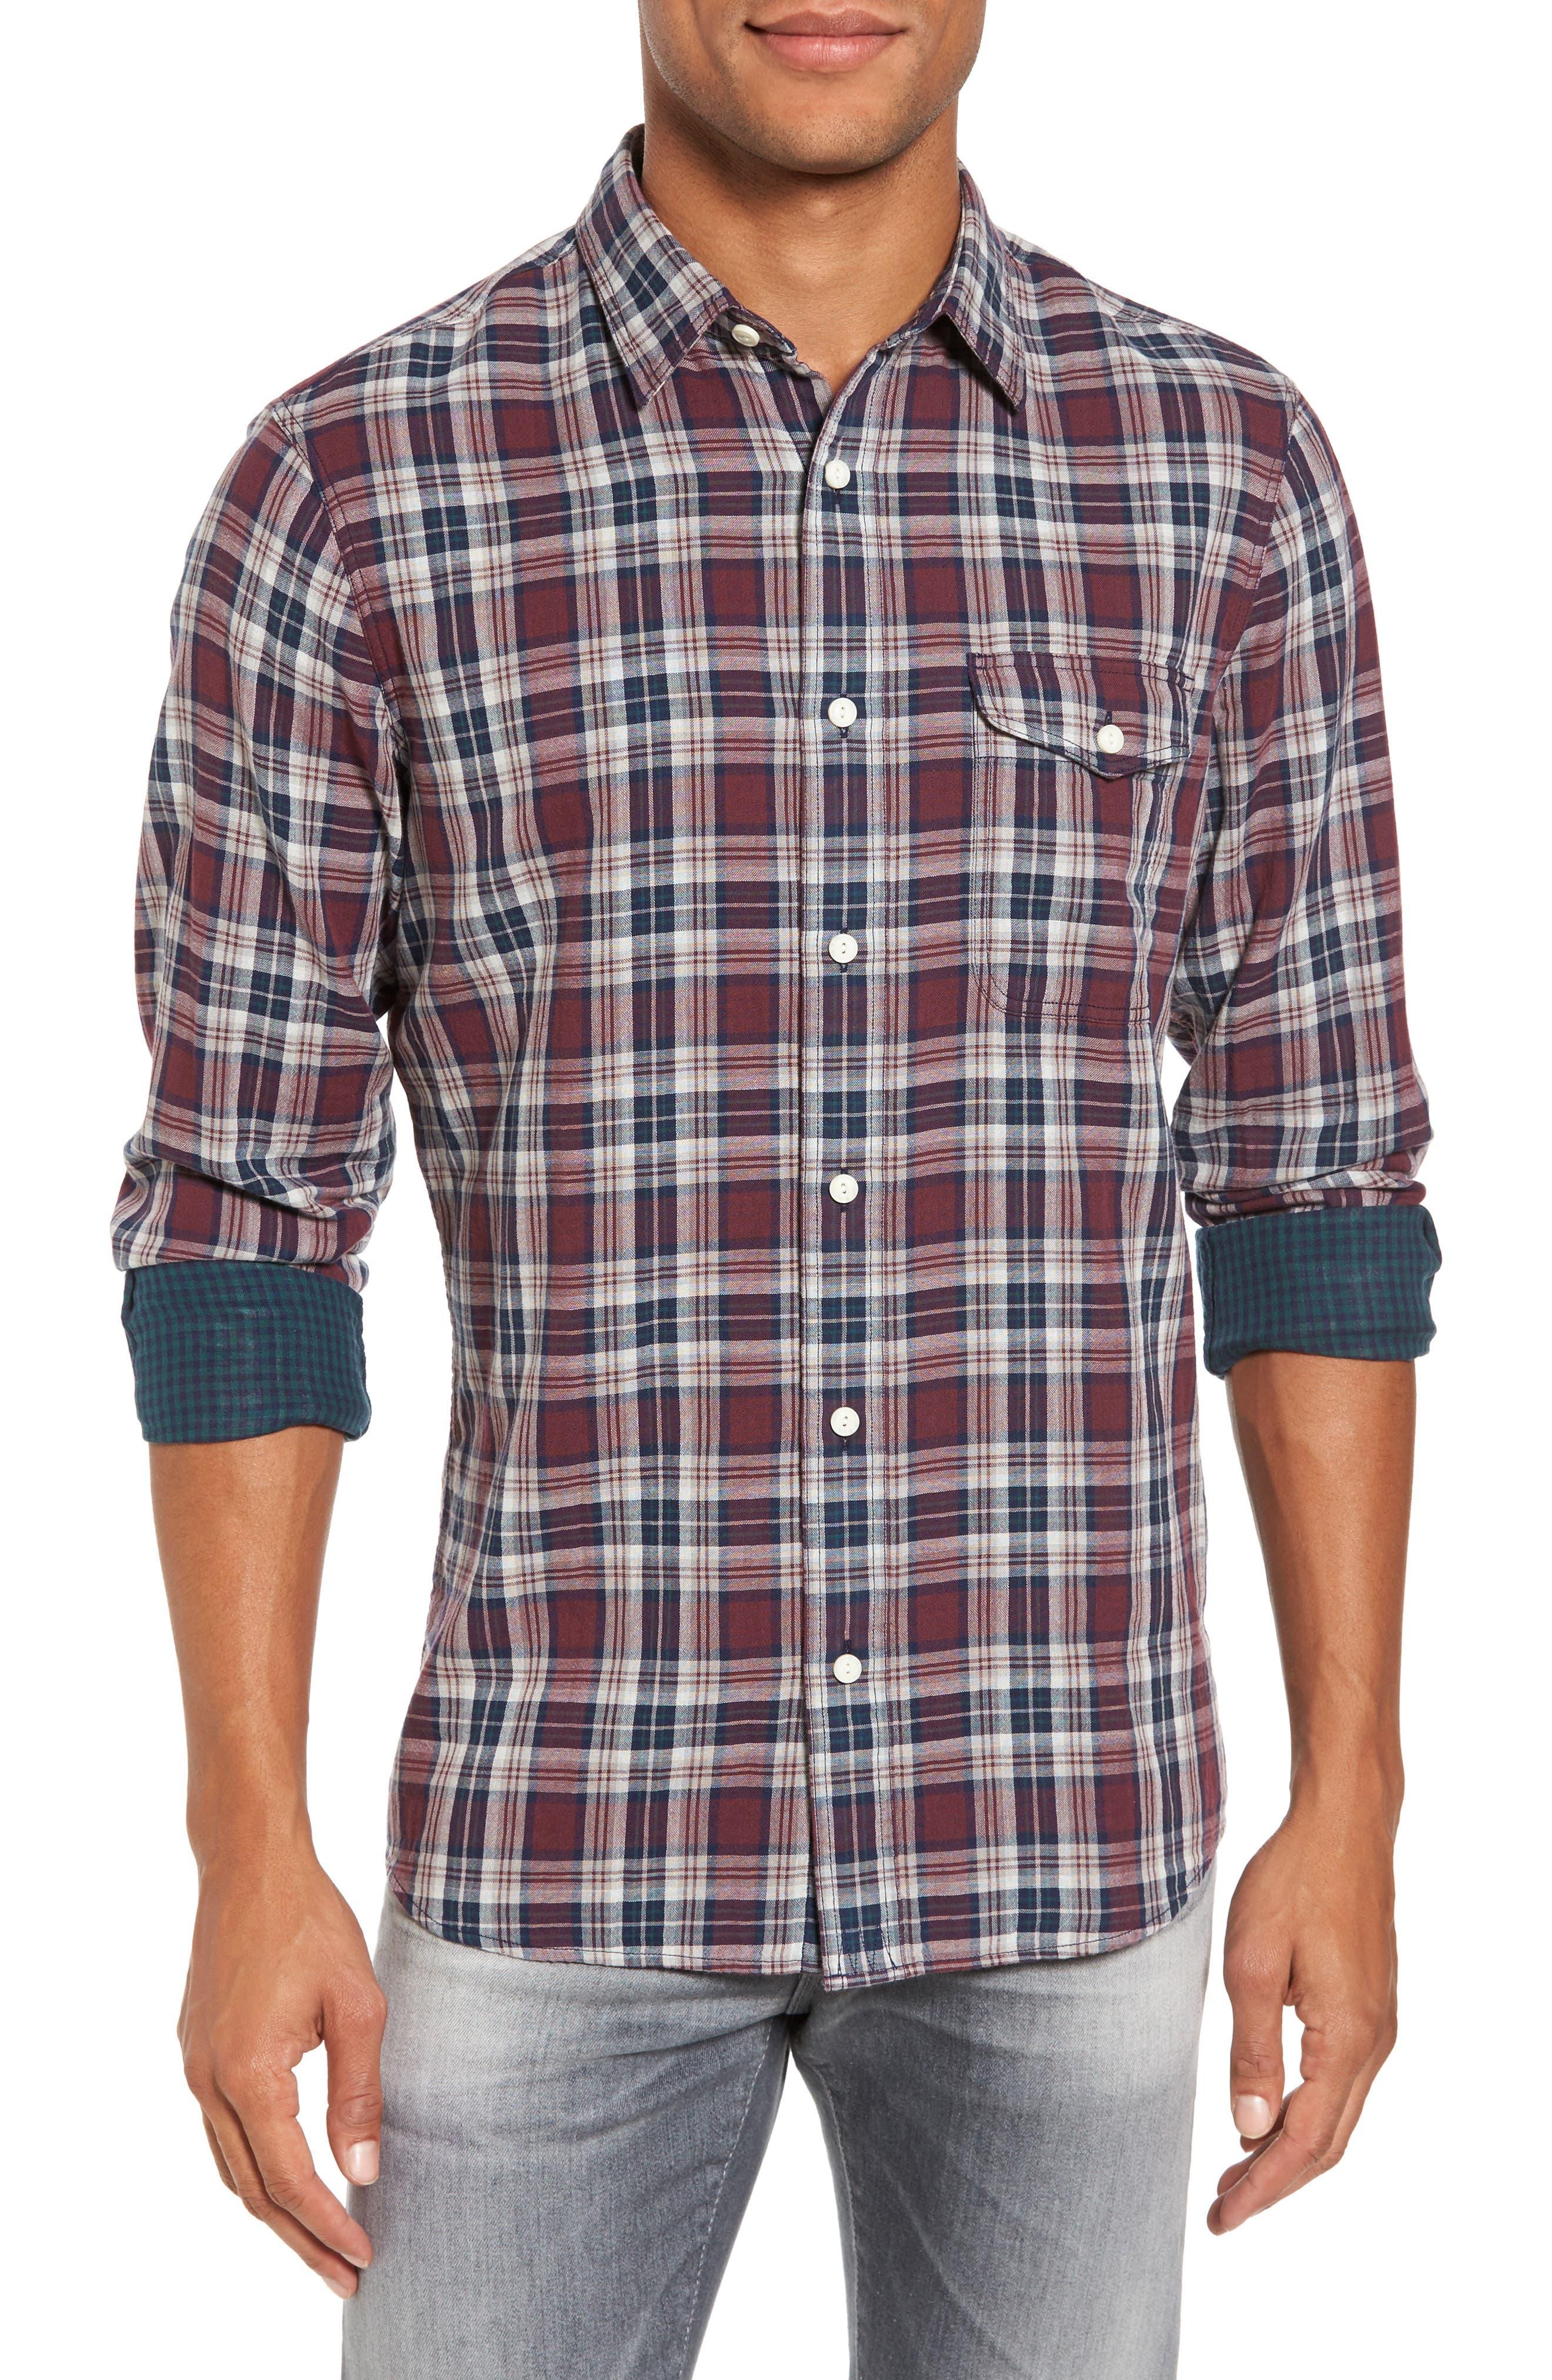 Lumber Duofold Slim Fit Plaid Shirt,                             Main thumbnail 1, color,                             938